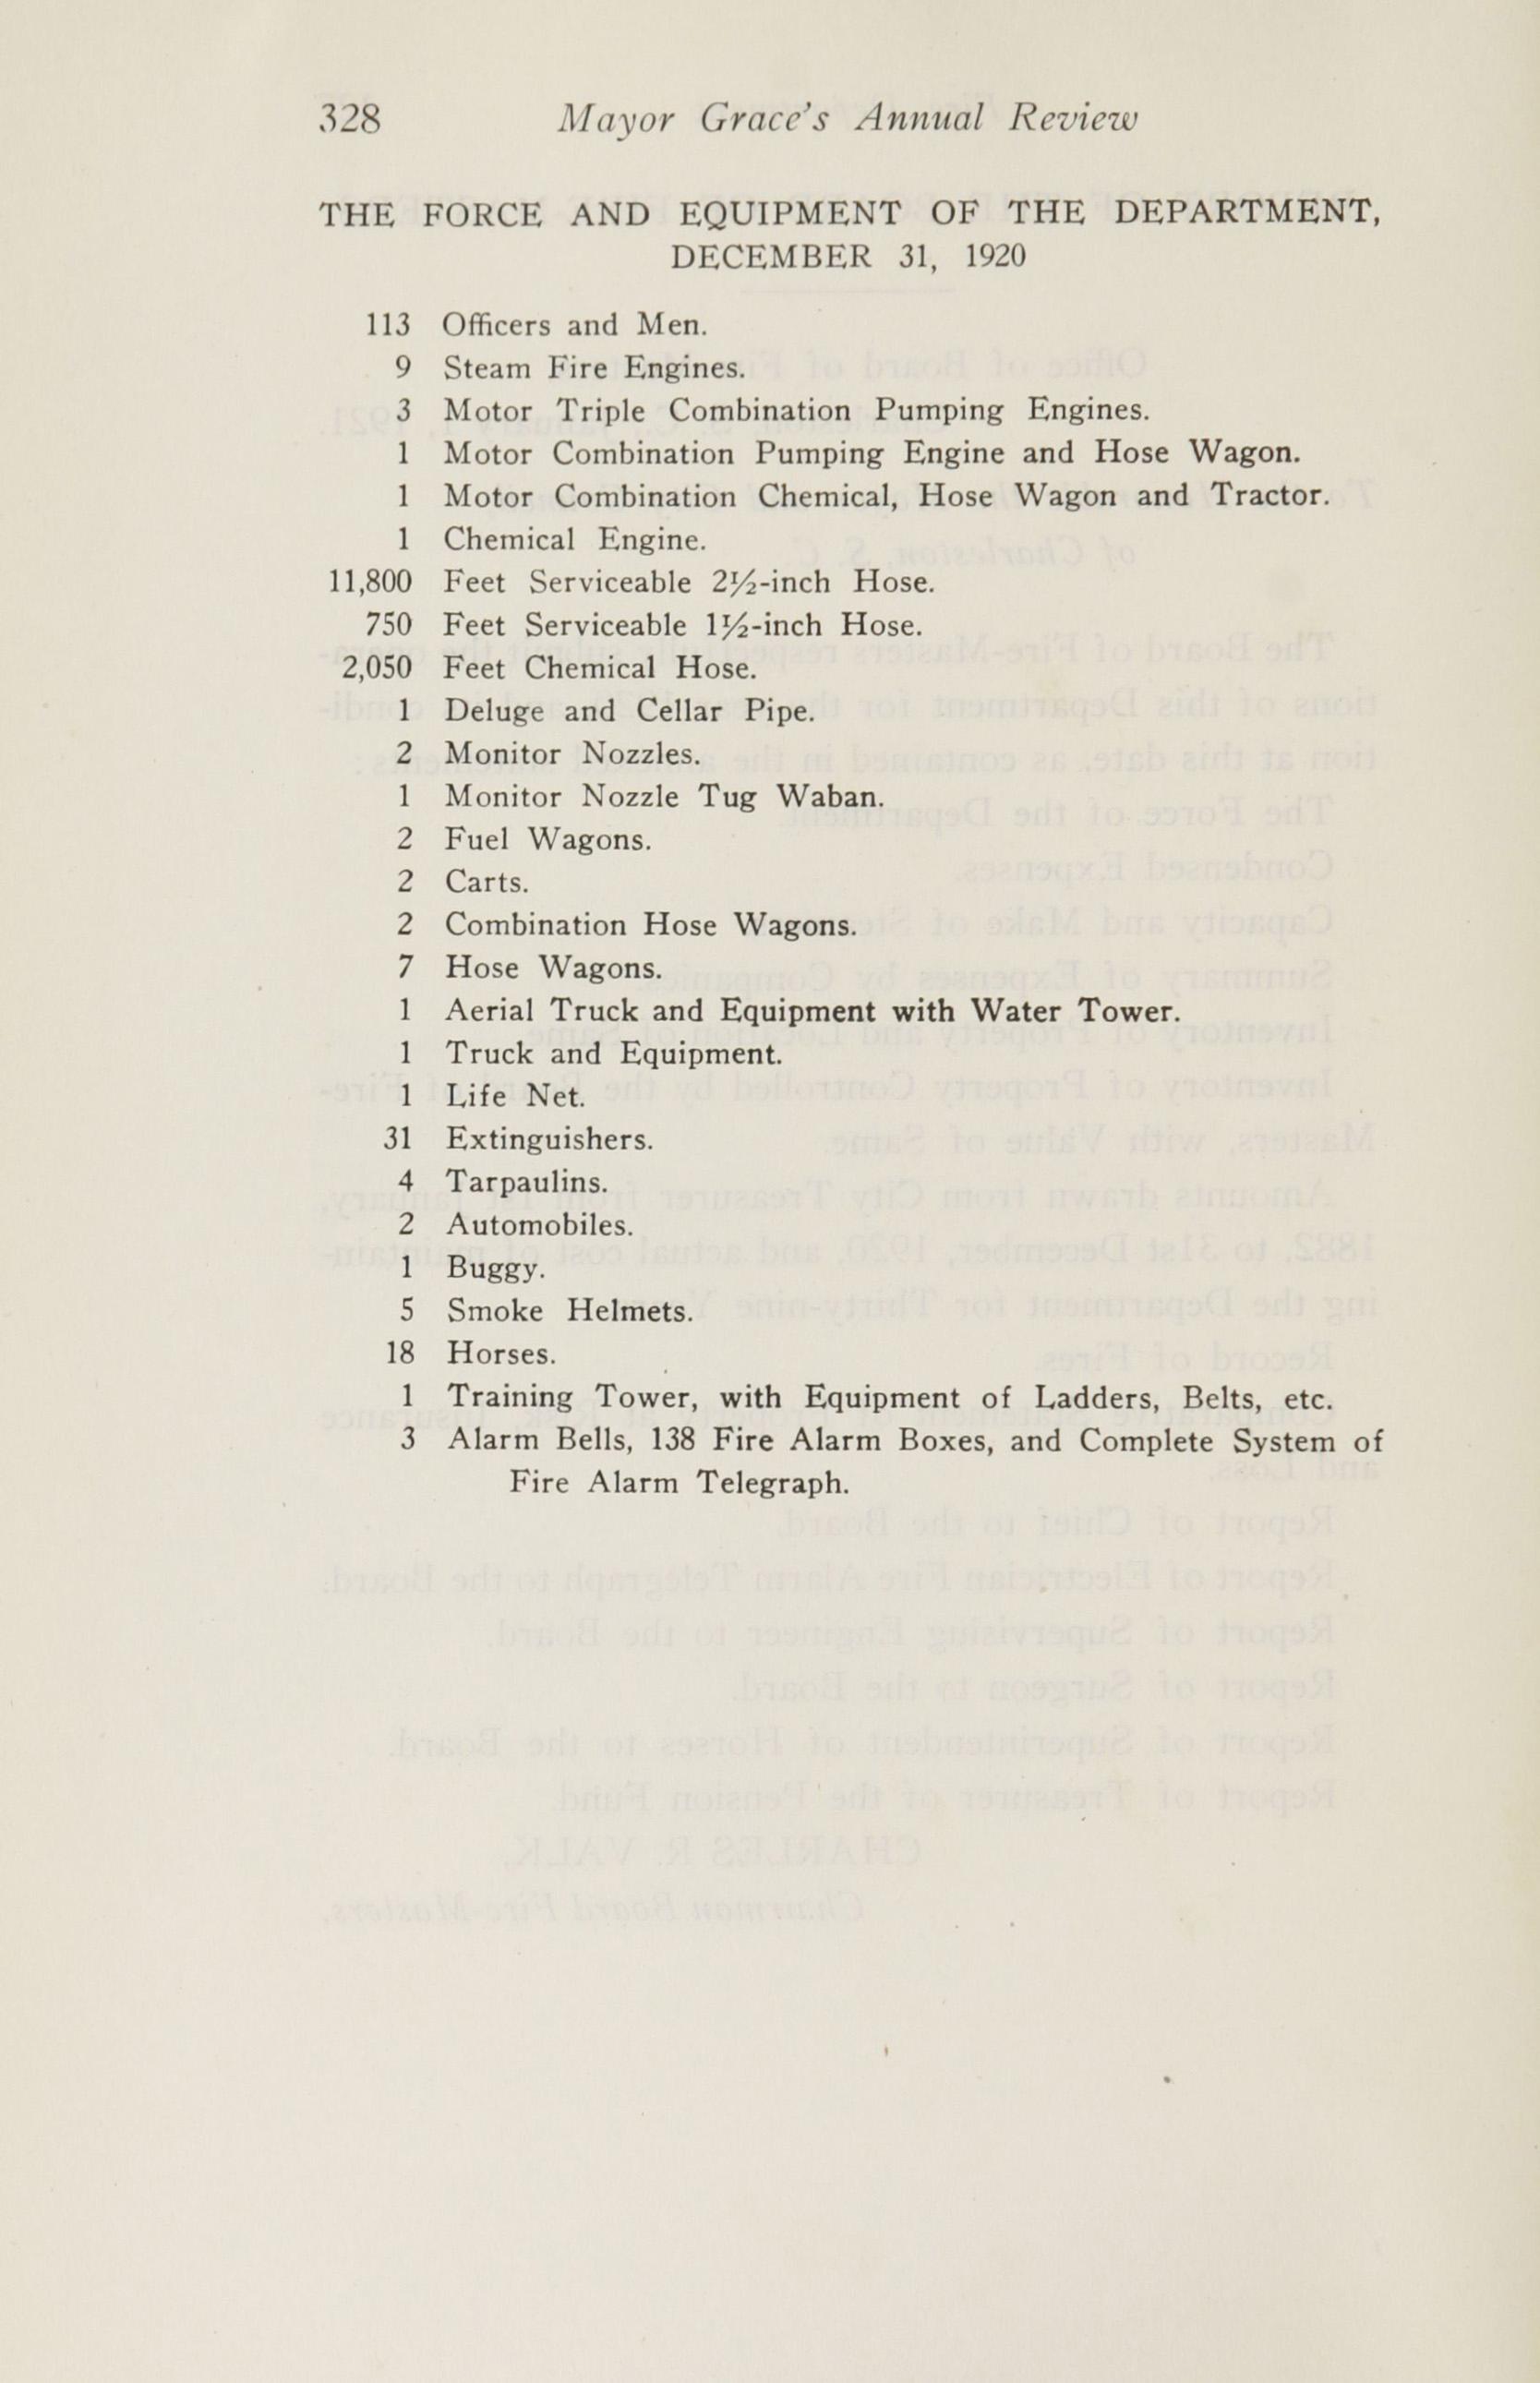 Charleston Yearbook, 1920, page 328